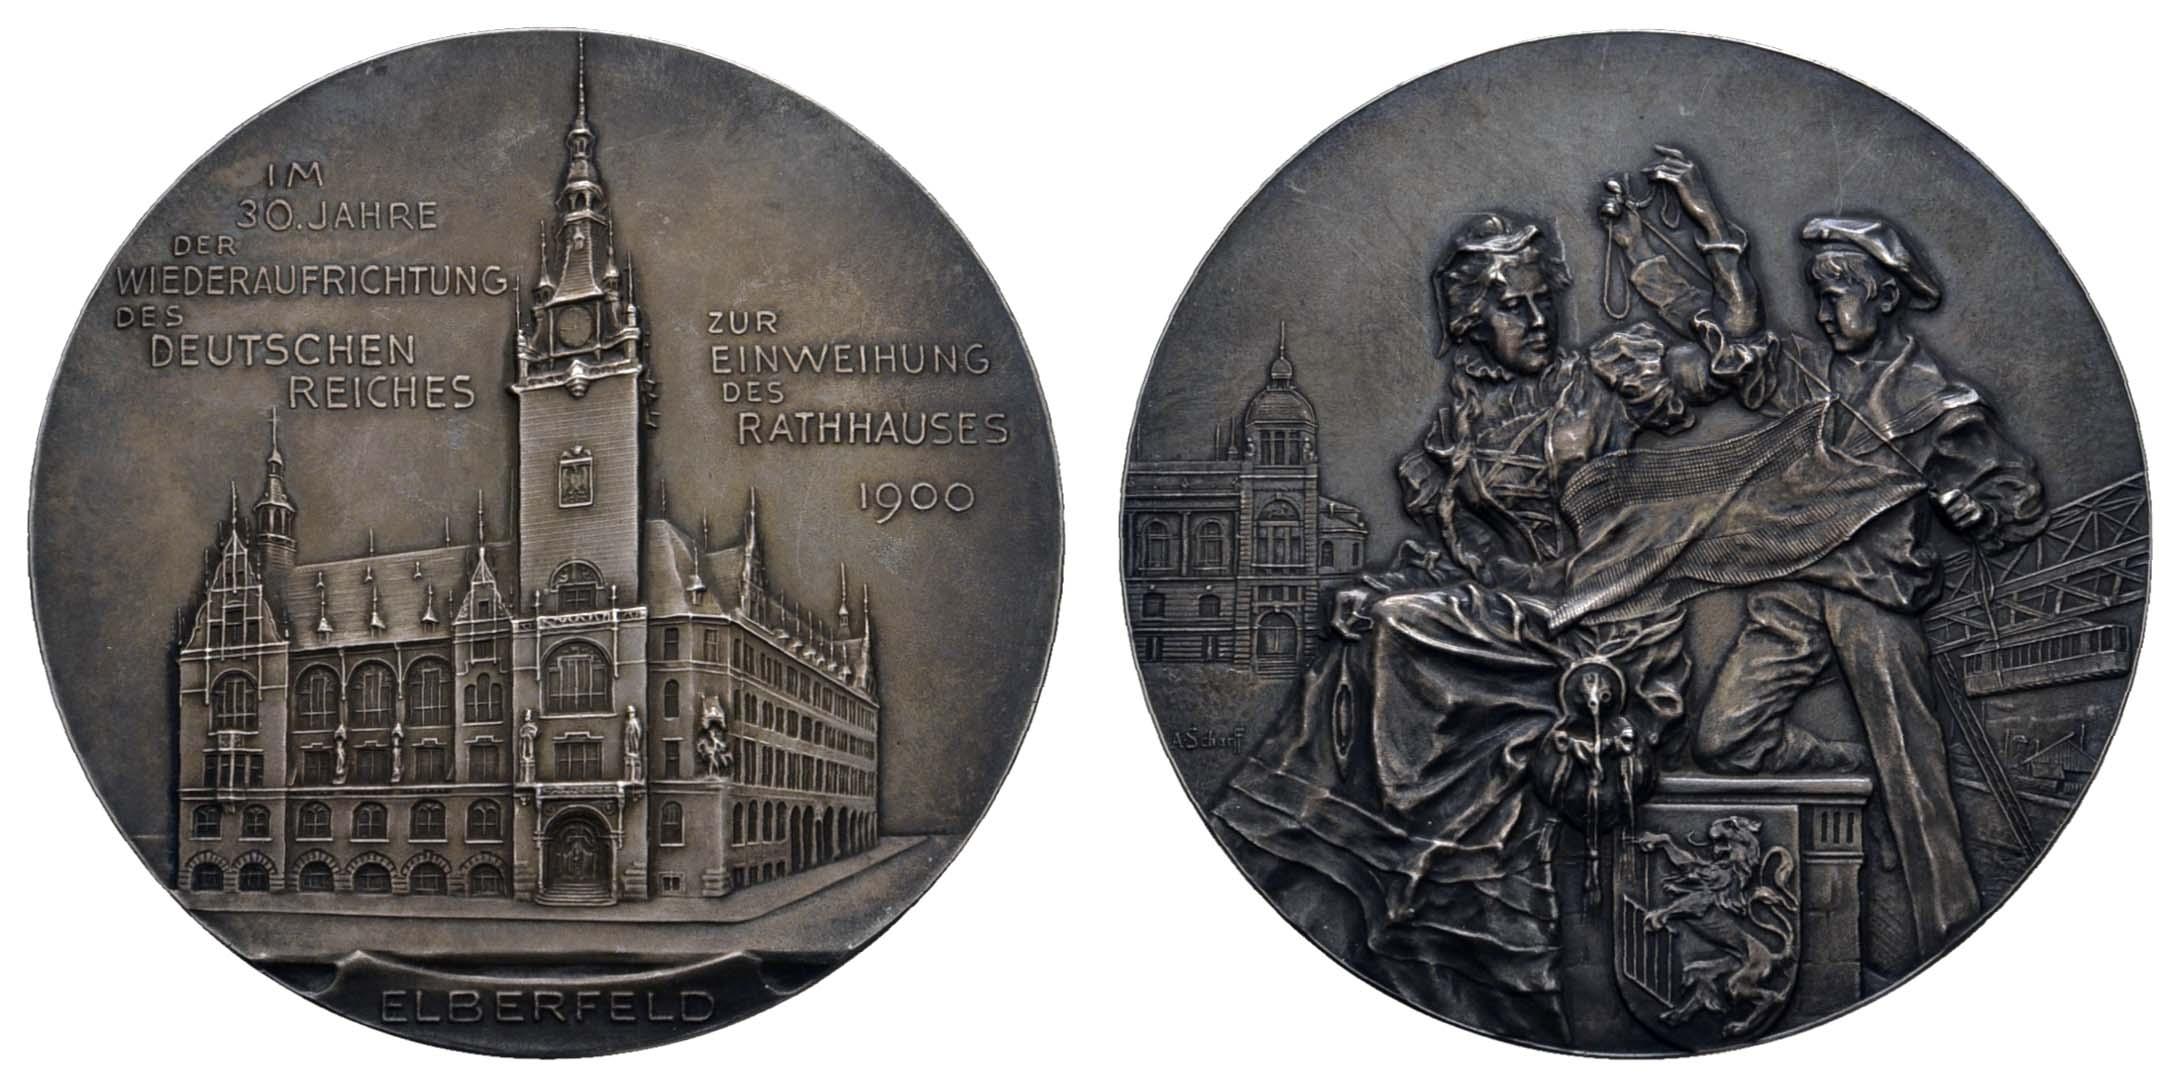 Lot 2312 - medaillen Sonstige Medaillen - Städtemedaillen -  Auktionshaus Ulrich Felzmann GmbH & Co. KG Coins single lots